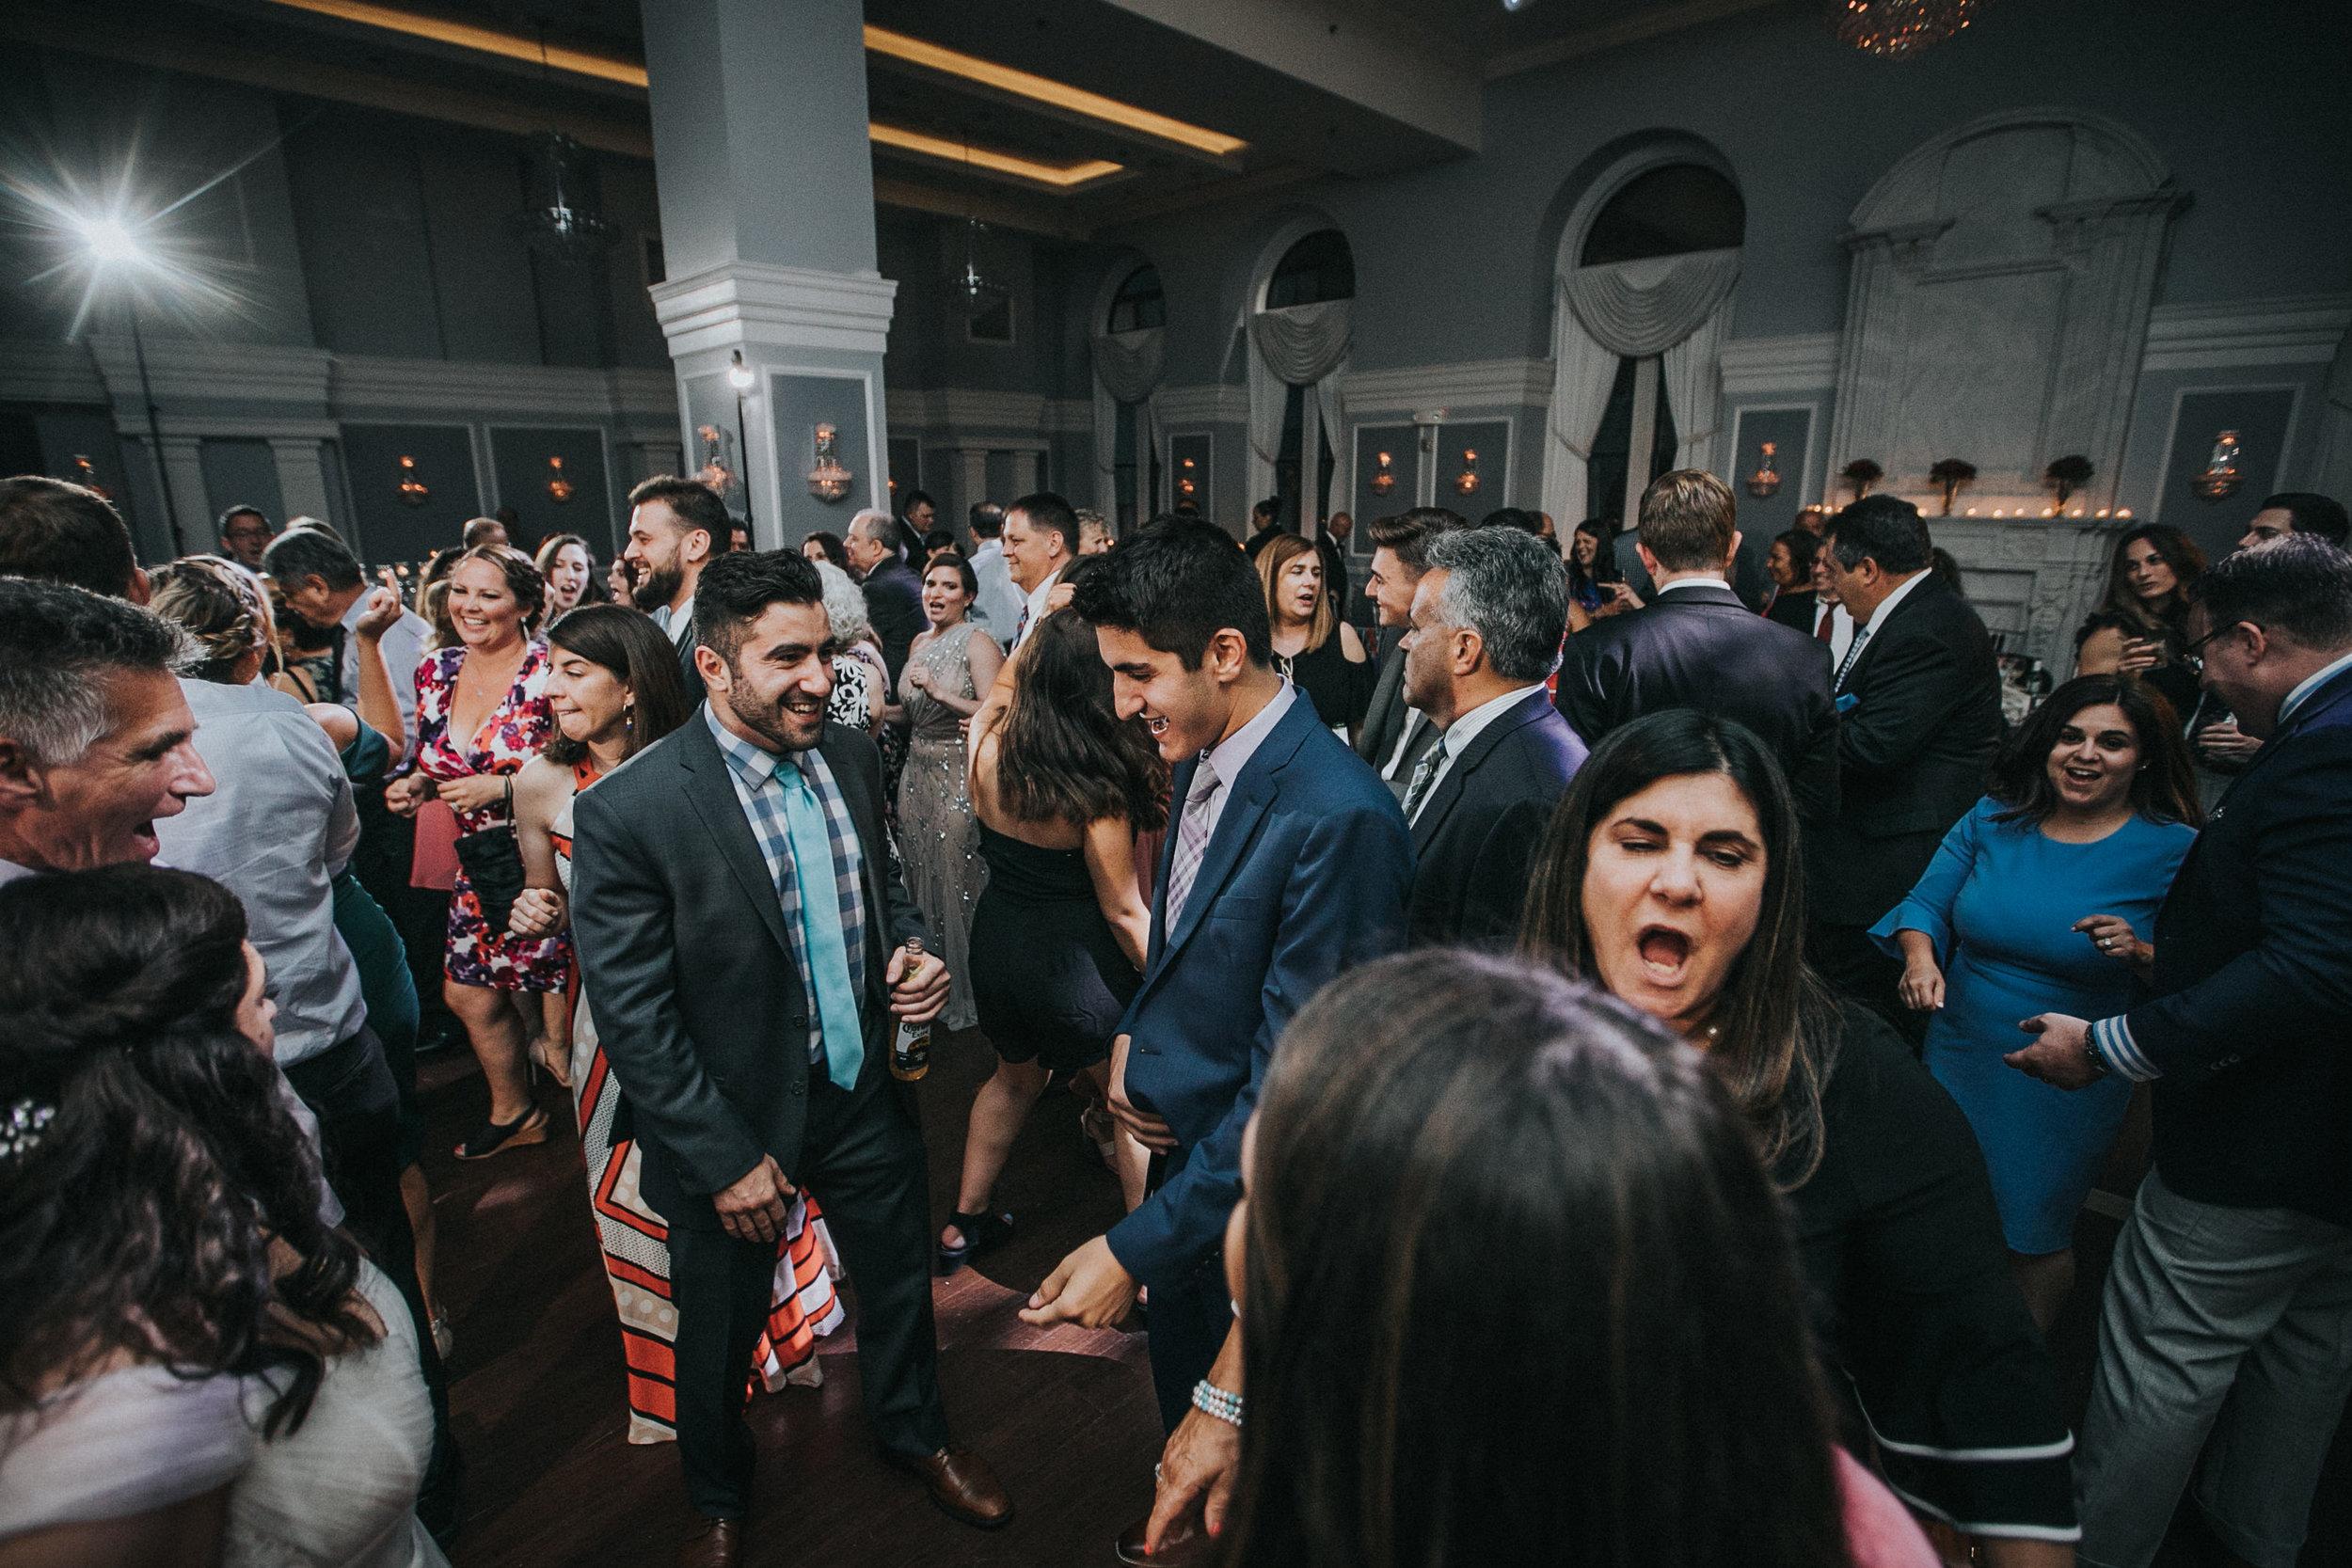 JennaLynnPhotography-NJWeddingPhotographer-Philadelphia-Wedding-ArtsBallroom-Reception-169.jpg